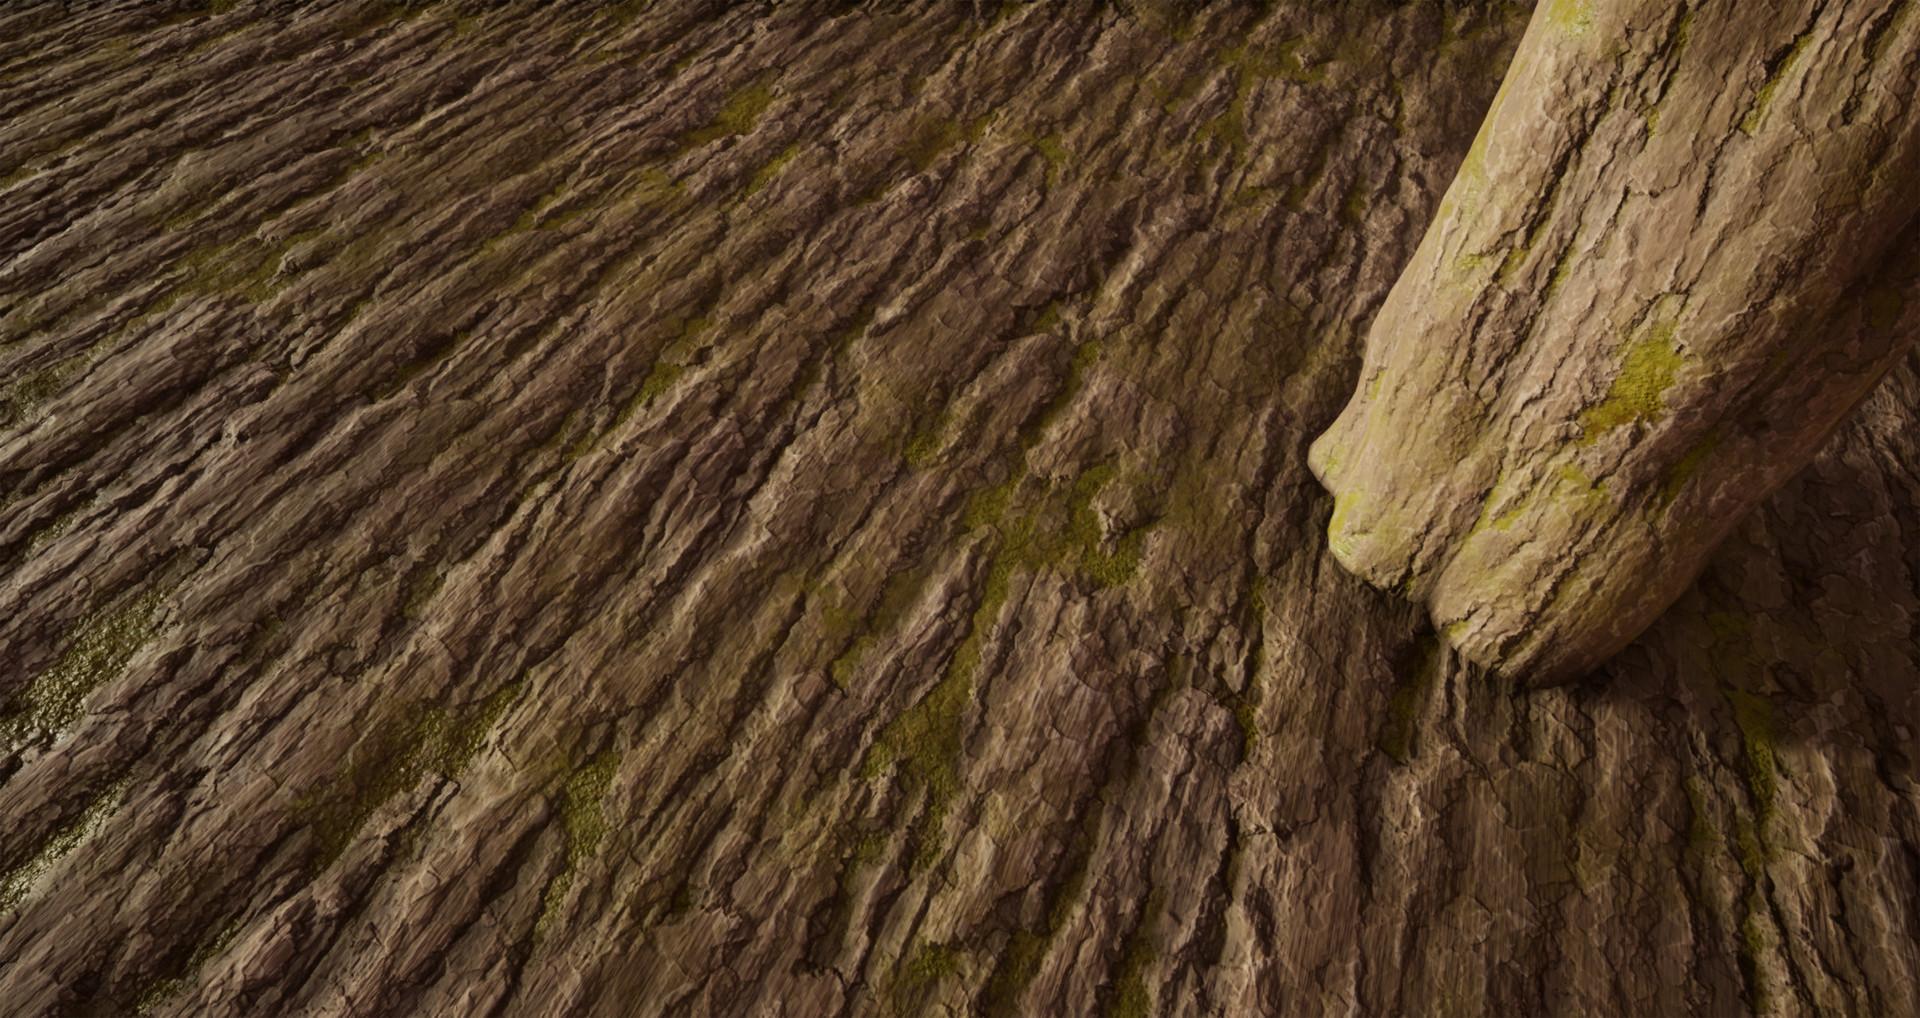 Joshua Chaplin | 3D Artist - TreeBark_02 | Substance Designer